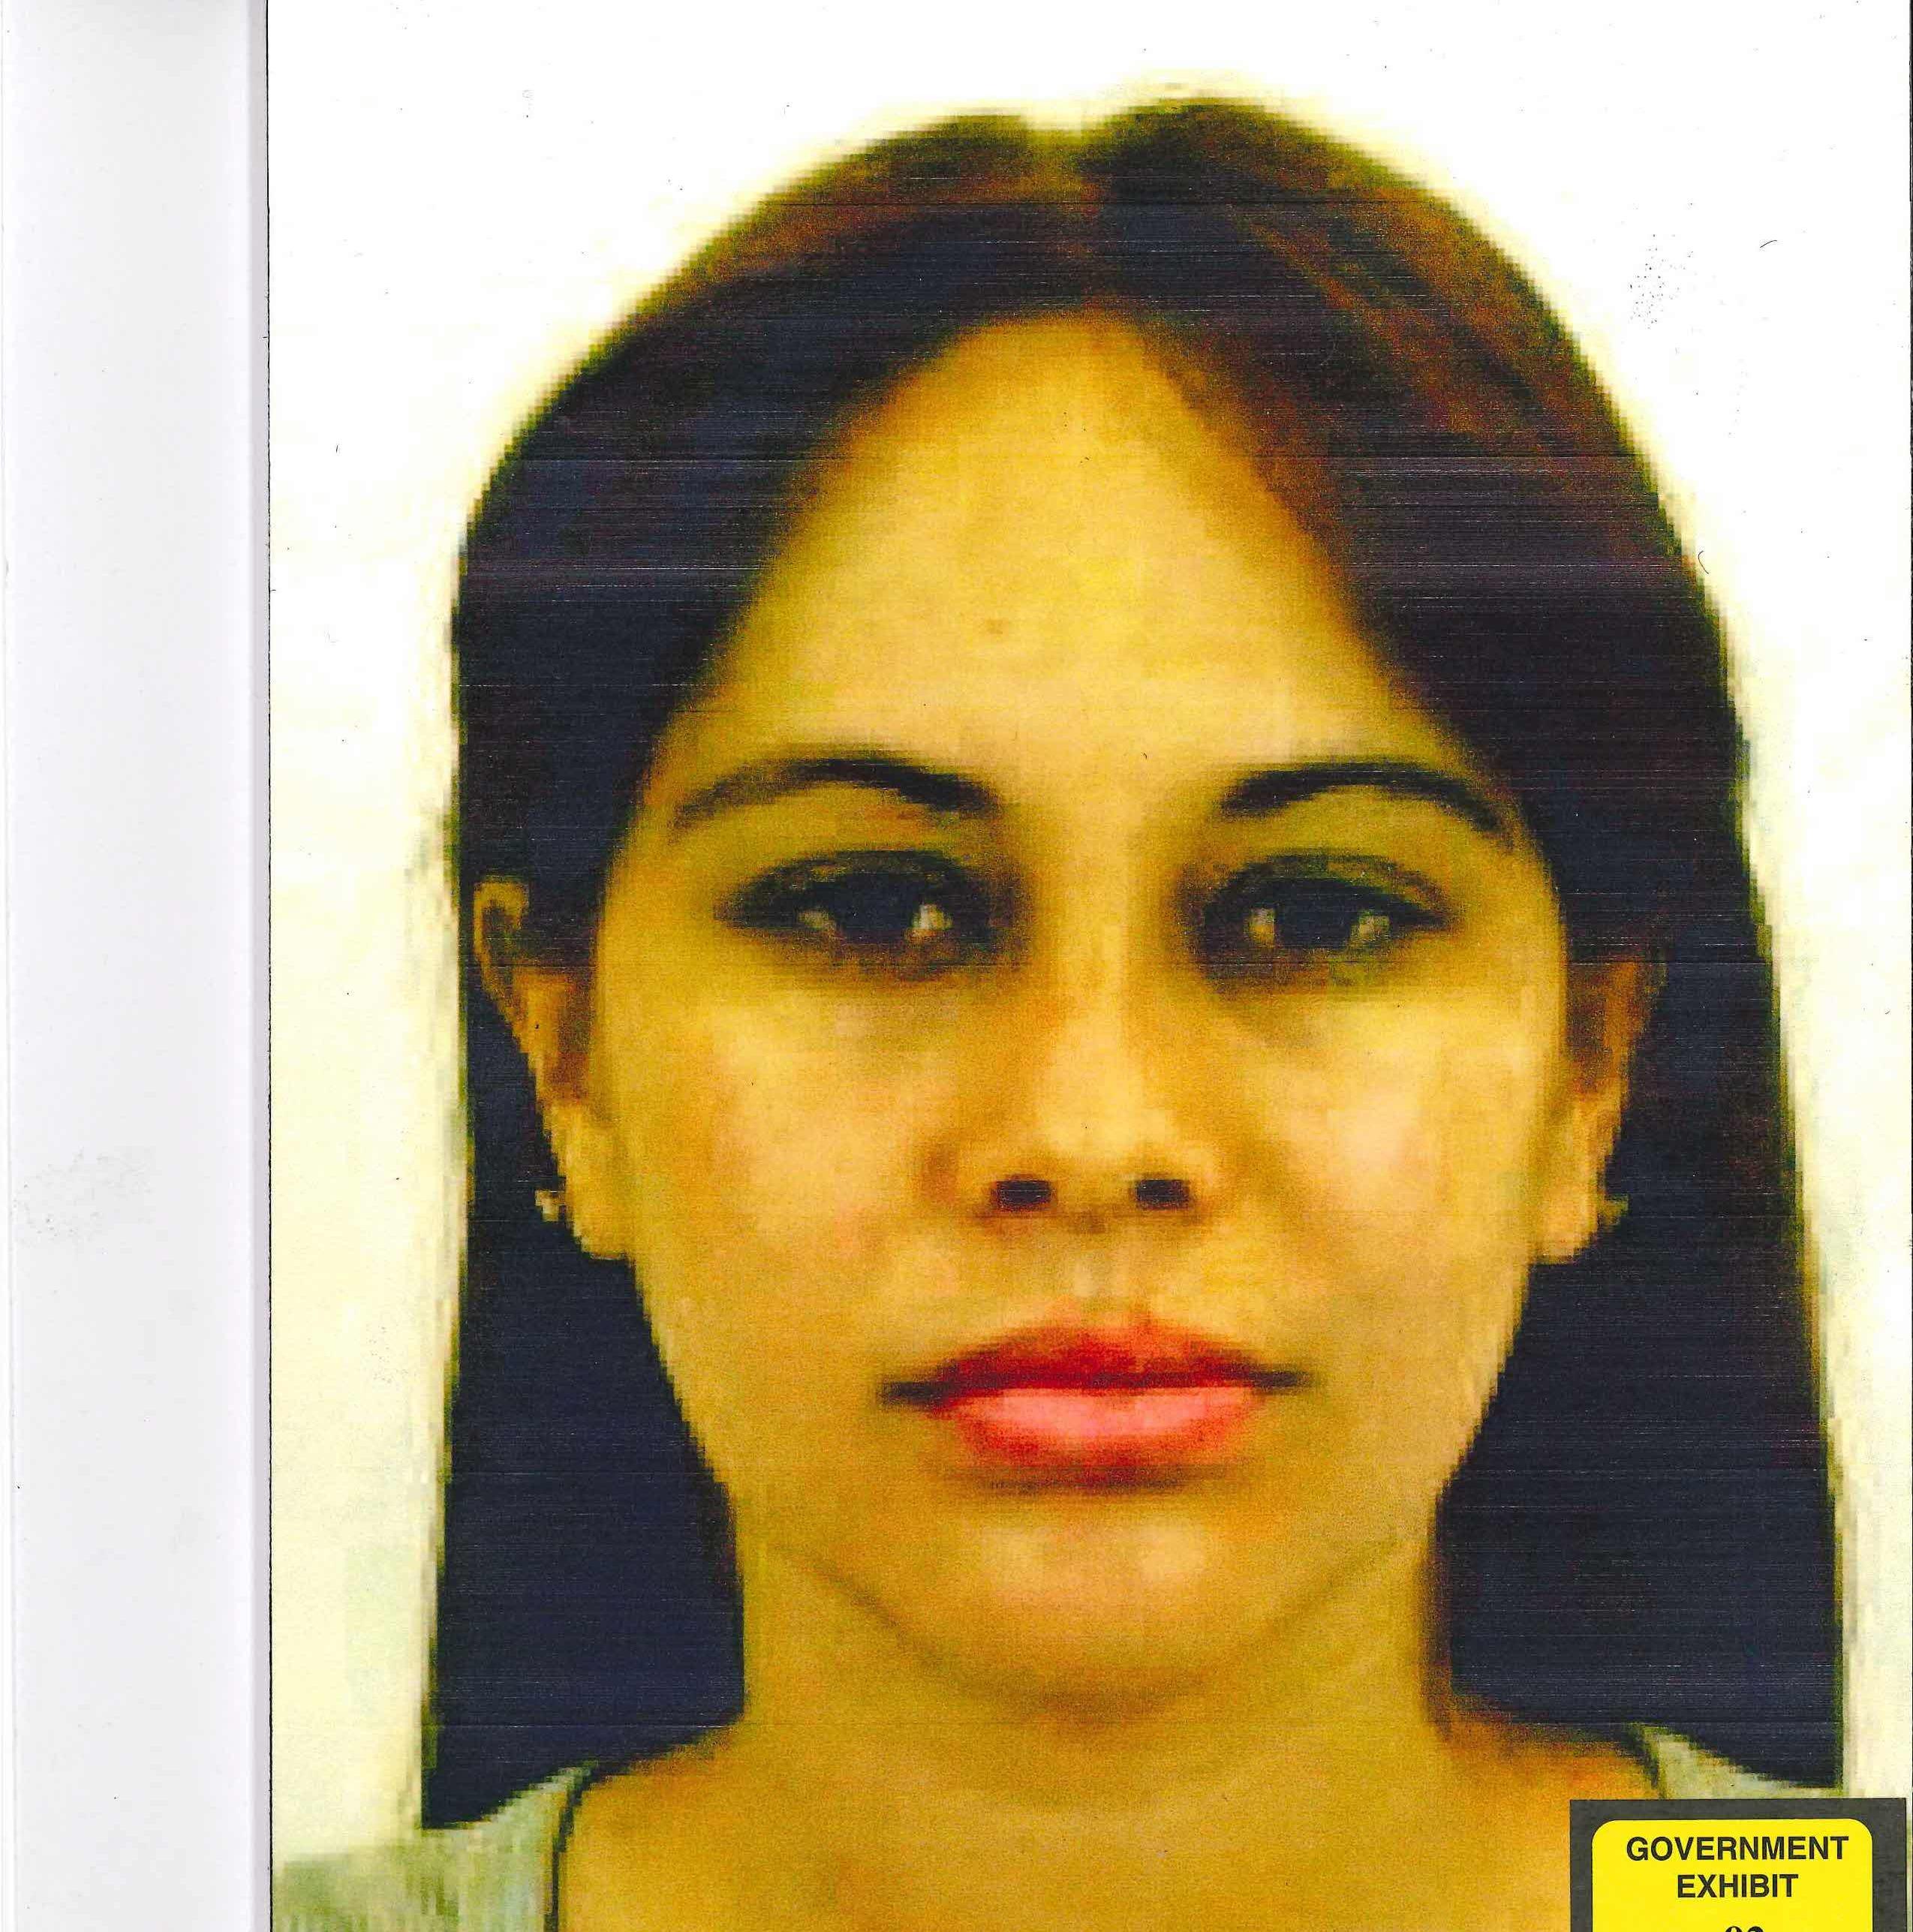 El Chapo's mistress flips, tells jurors about his alleged drug crimes